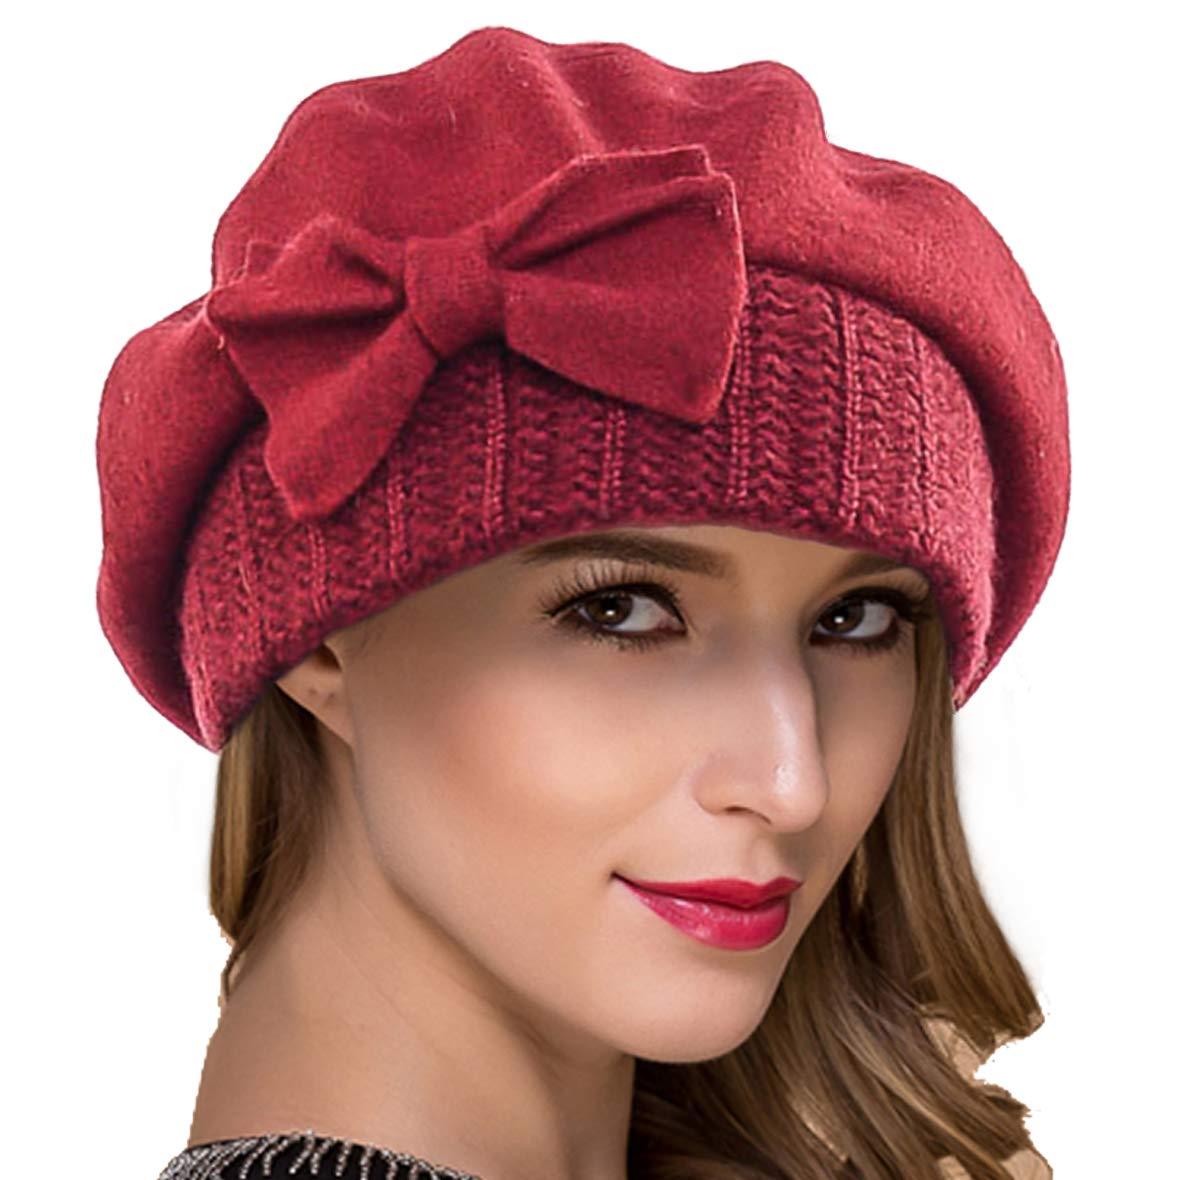 Ruphedy Women French Beret Knit Wool Beret Beanie Winter Dress Hats Hy022 (Claret)